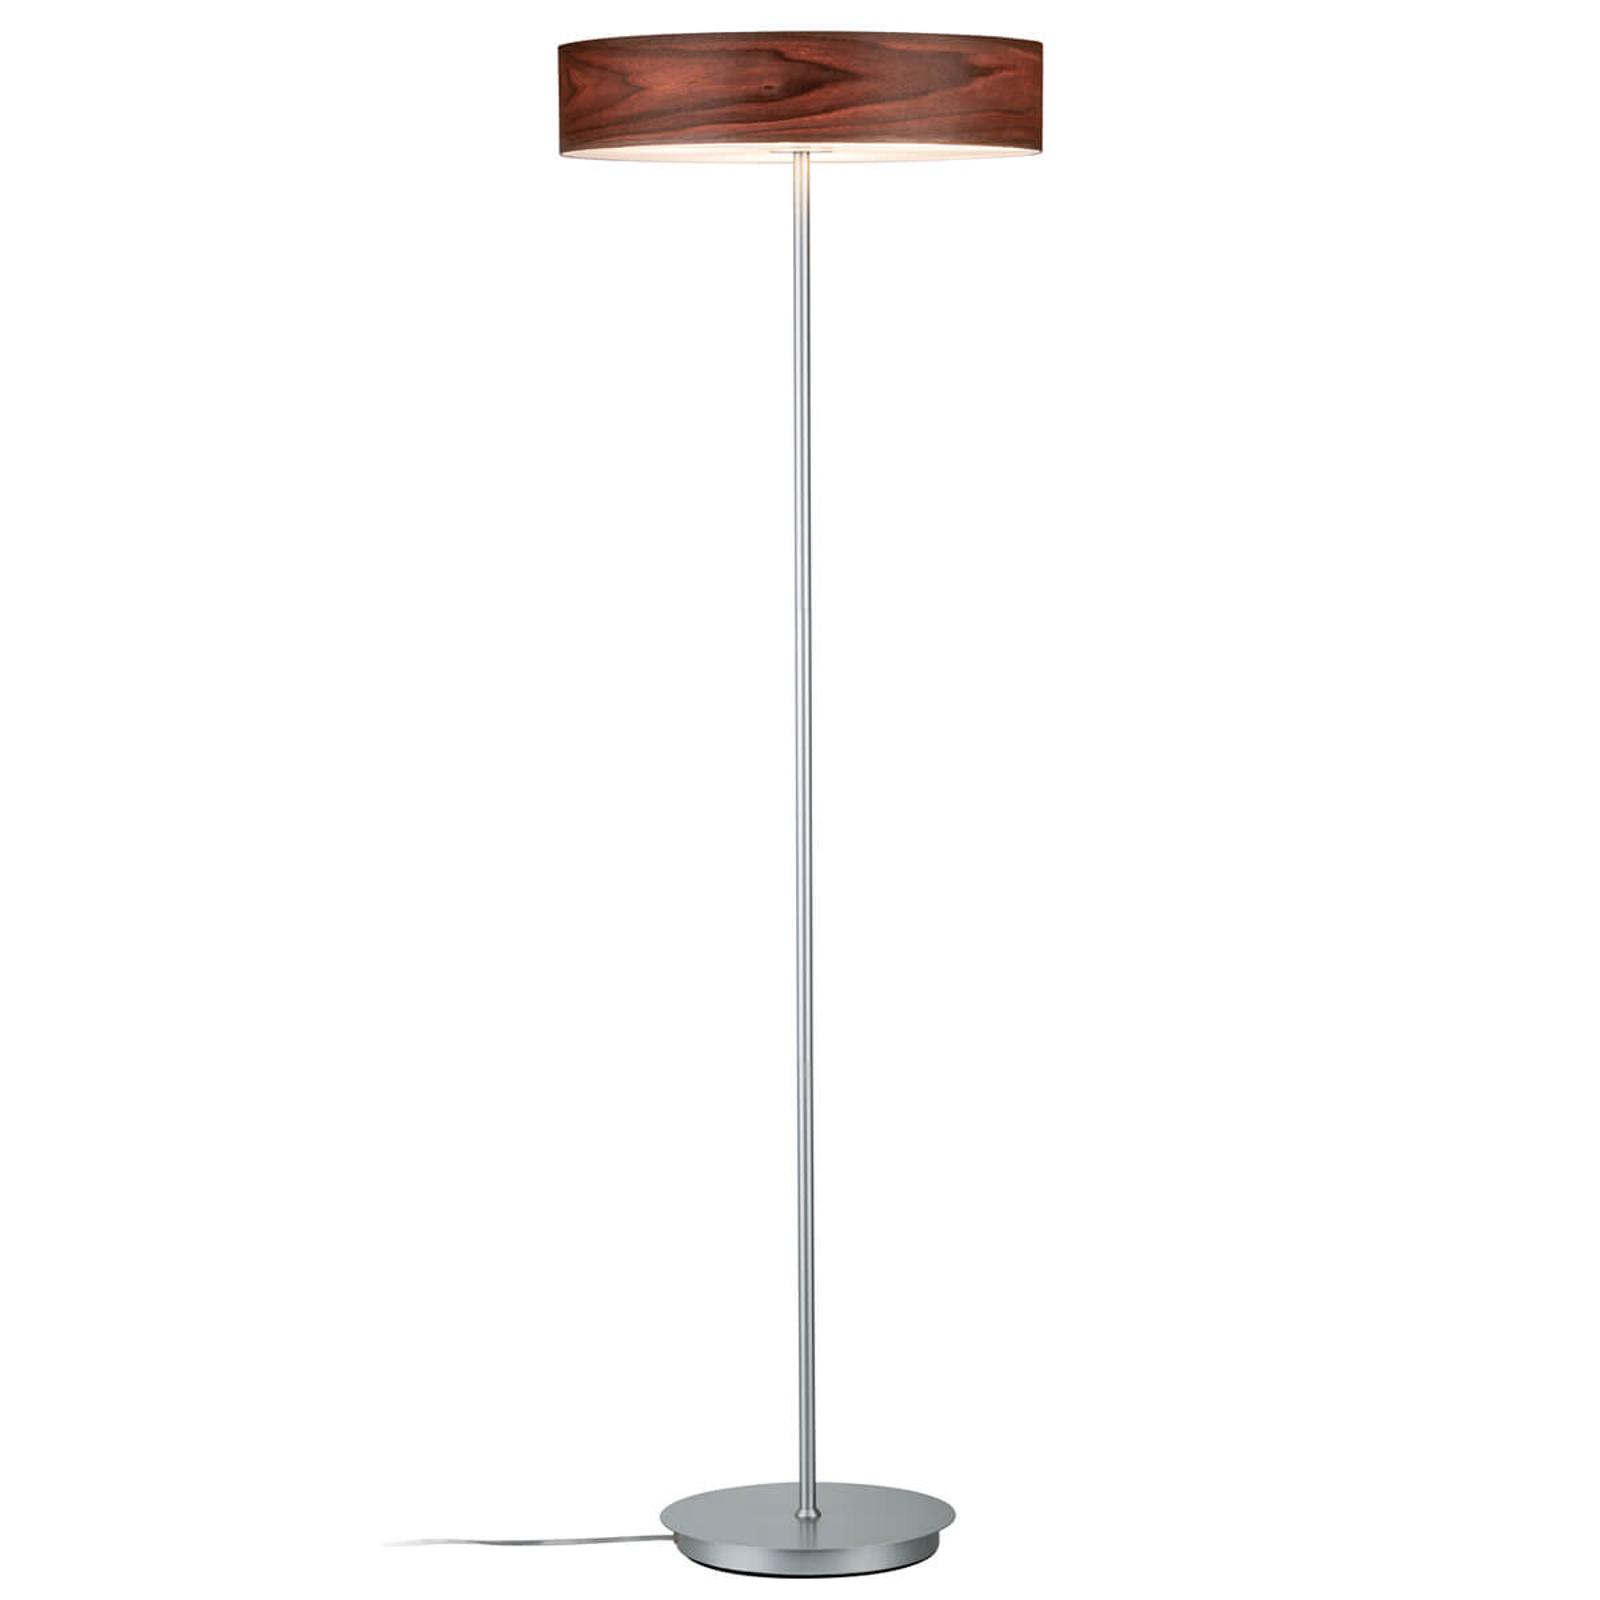 Lampadaire moderne Liska avec abat-jour en bois